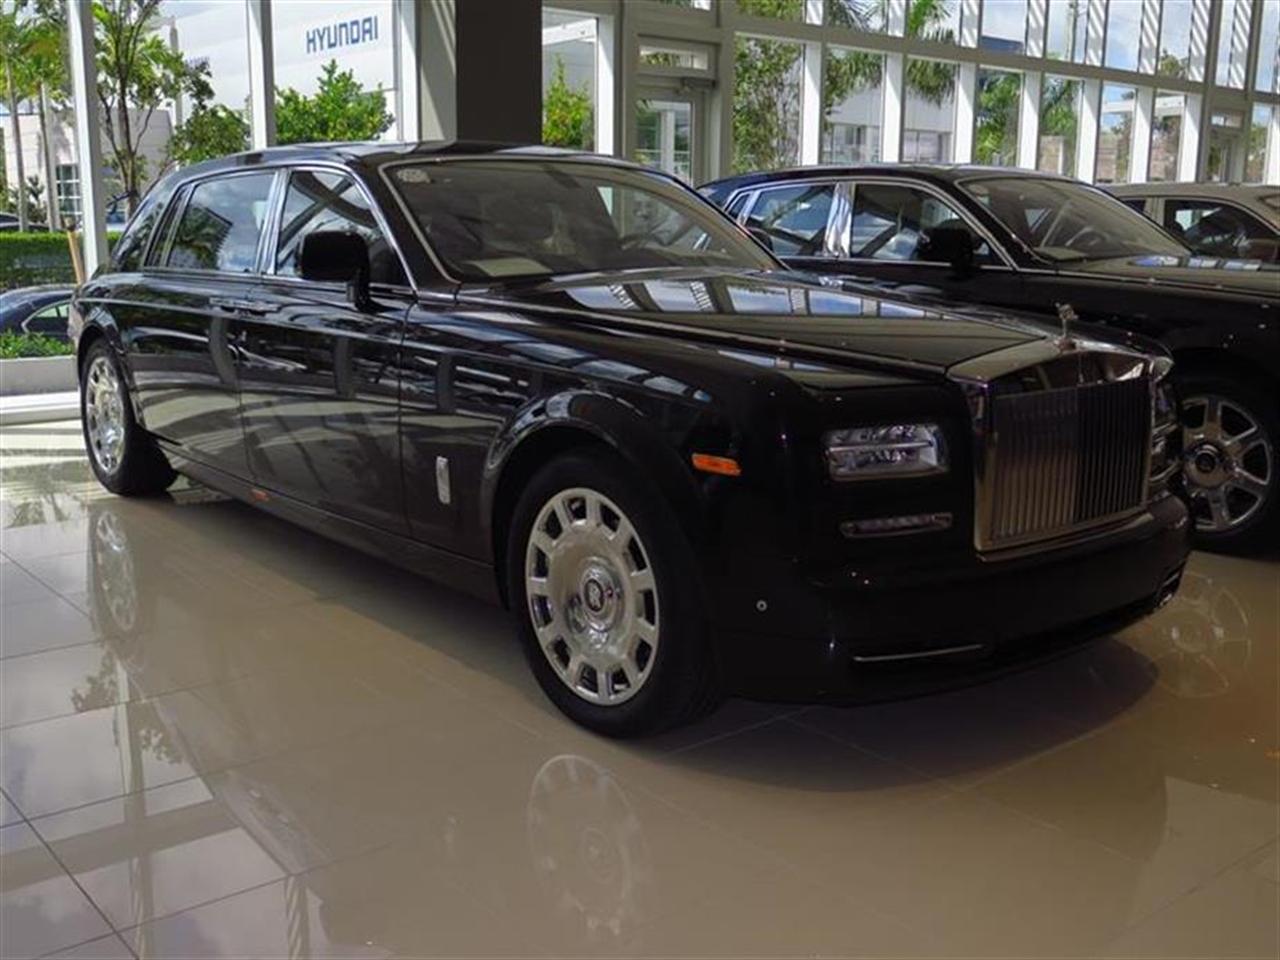 2013 Rolls Royce PHANTOM 4dr Sdn EWB 10050 miles 4-zone auto climate control -inc rear seat cont